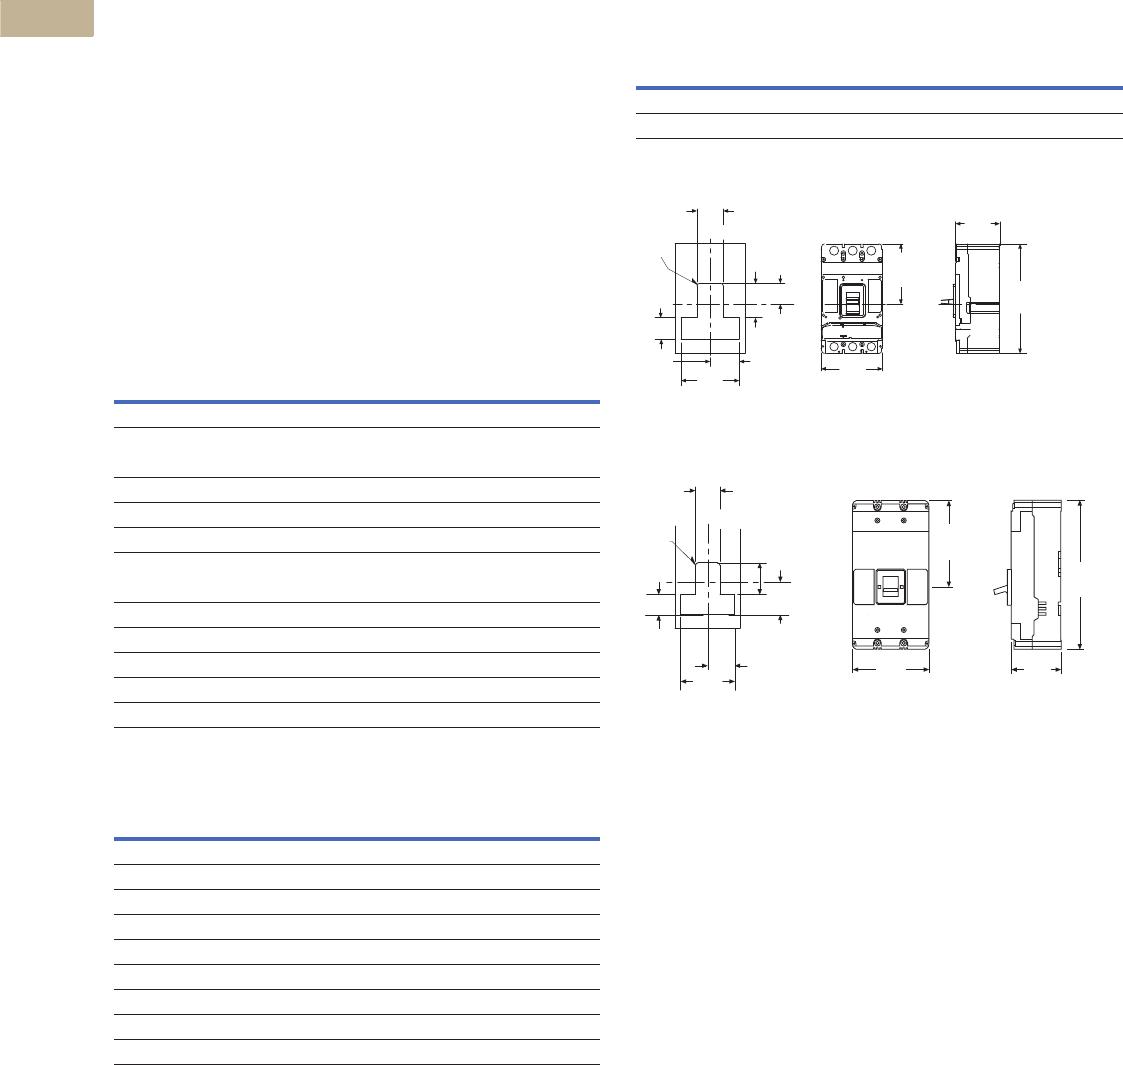 Volume 4 Tab 2 76301 Catalog Circuit Breaker Used Cutler Hammer Ed3150 150 Amp V4 T2 98 4circuit Protection Ca08100005ejune 2014 Eatoncom